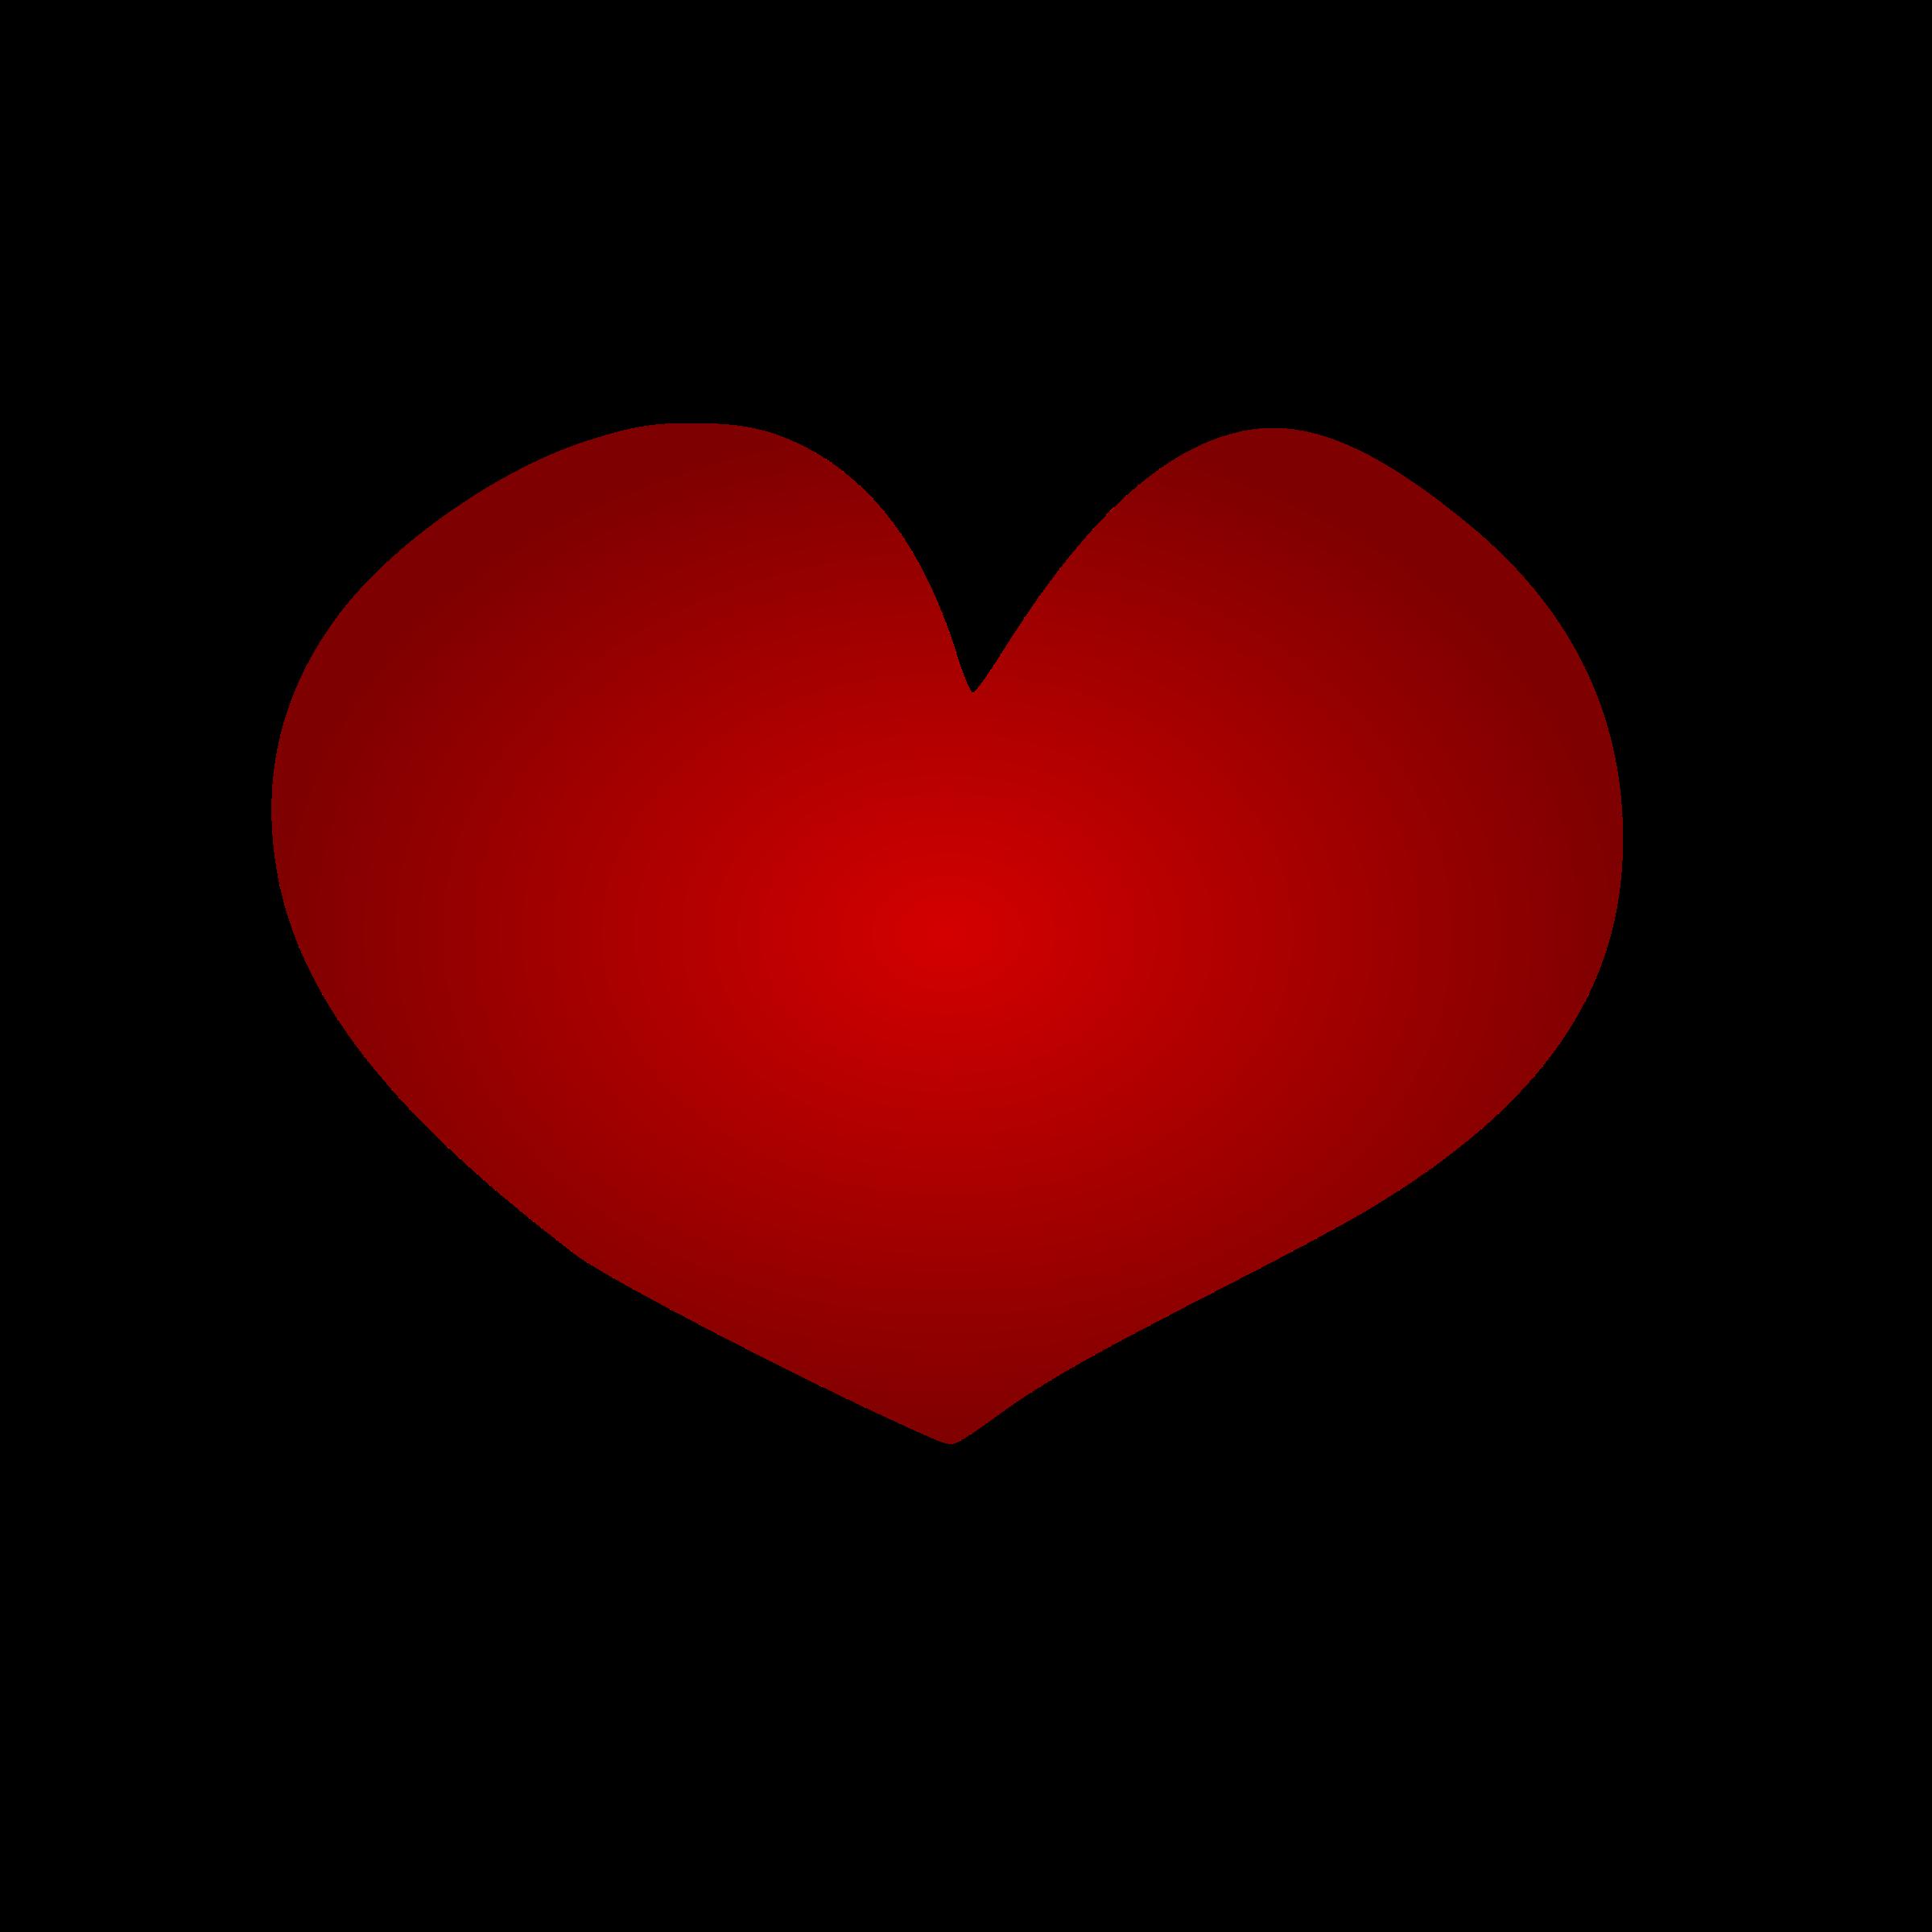 Сердечко картинка для презентации